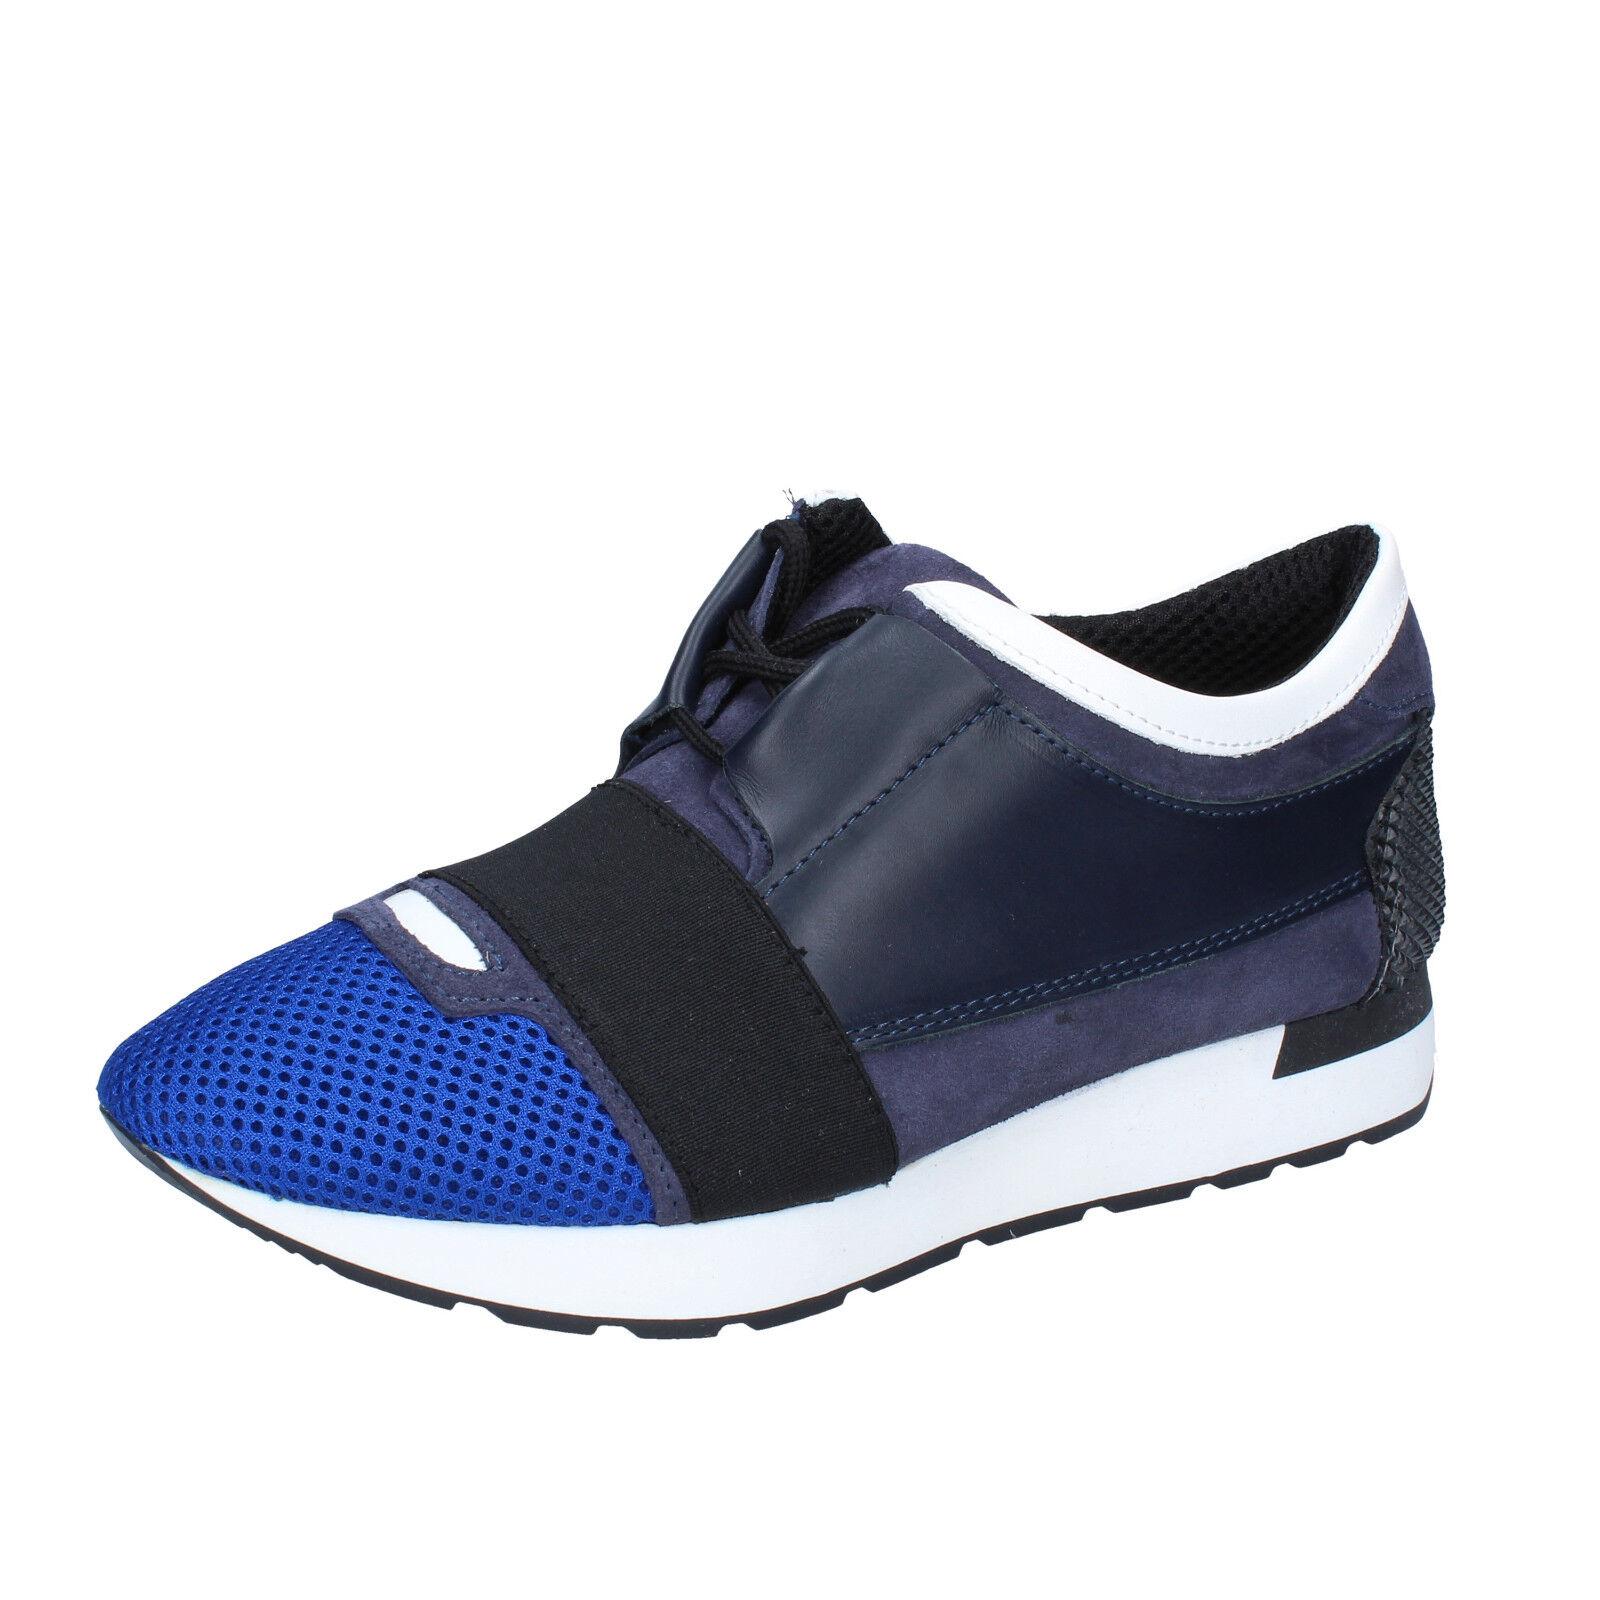 Mens shoes SALVO FERDI 9 (EU 43) sneakers black bluee suede leather BZ614-D